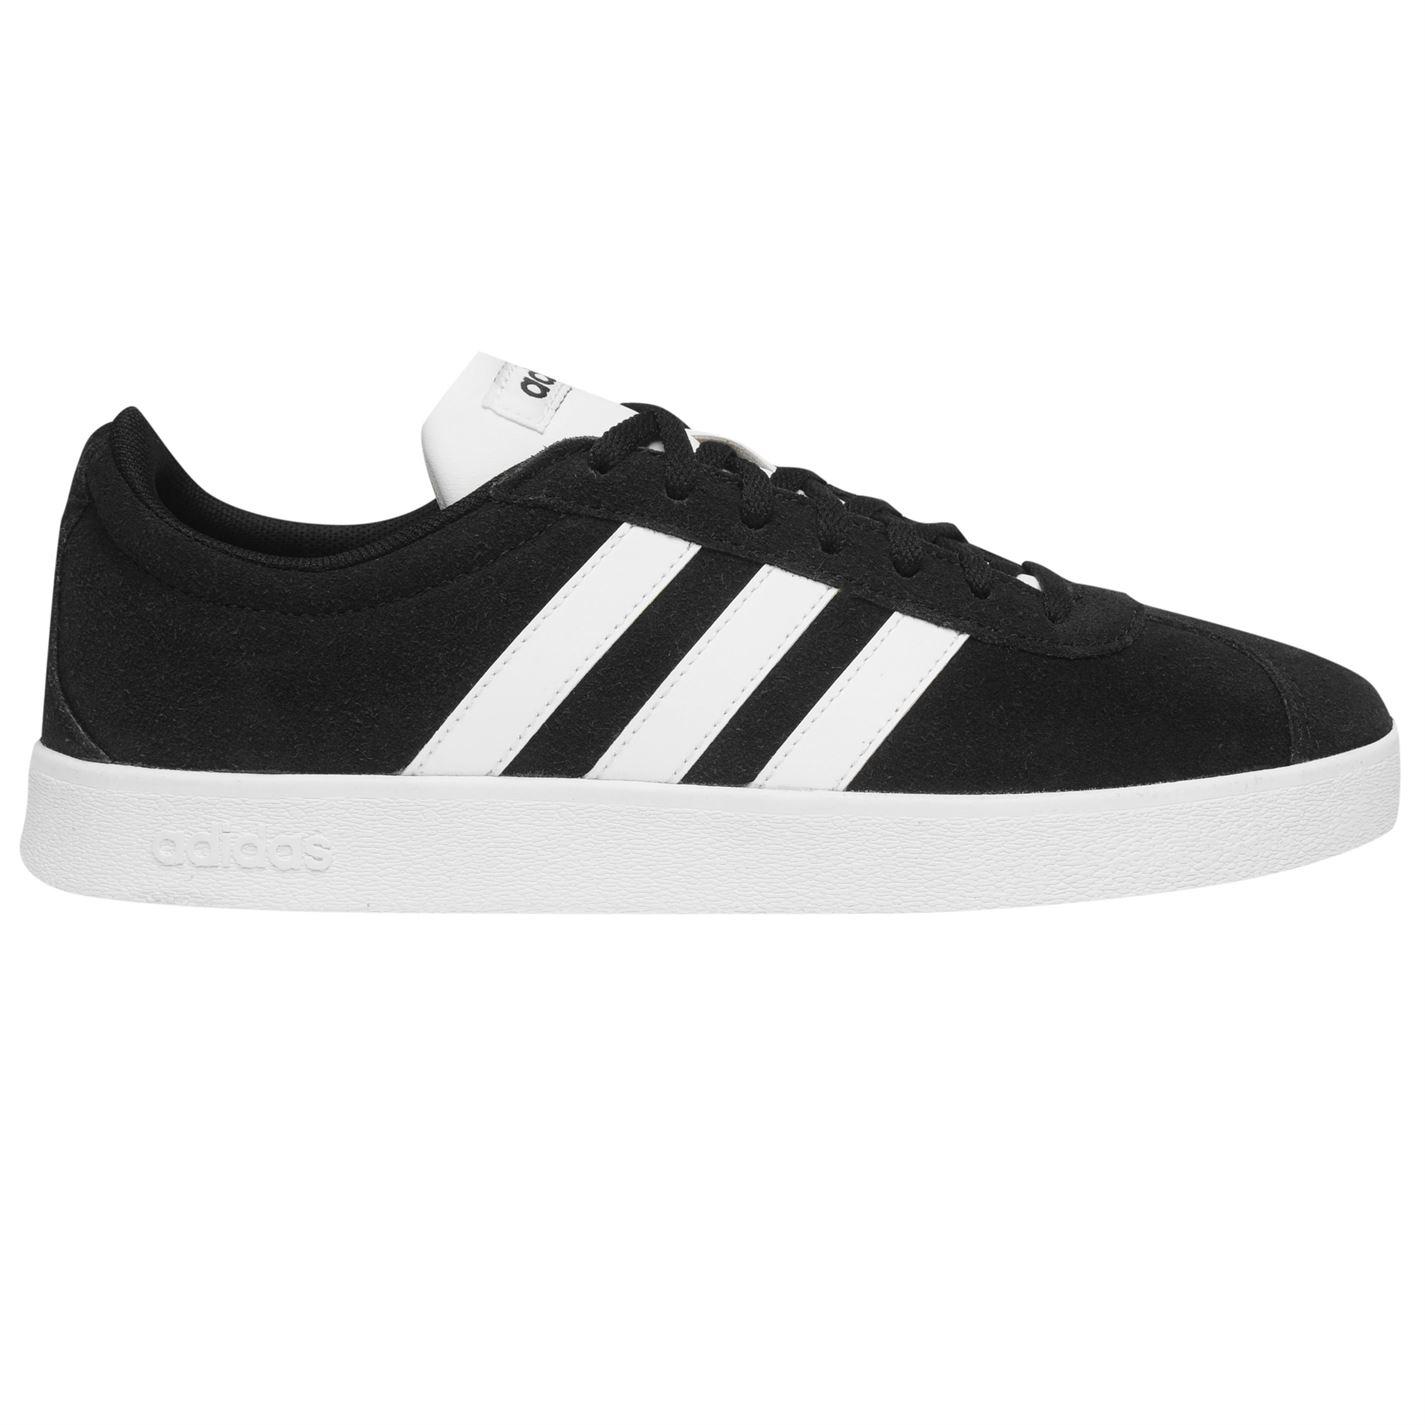 Adidas VL Court 2 Suede Shoes Mens